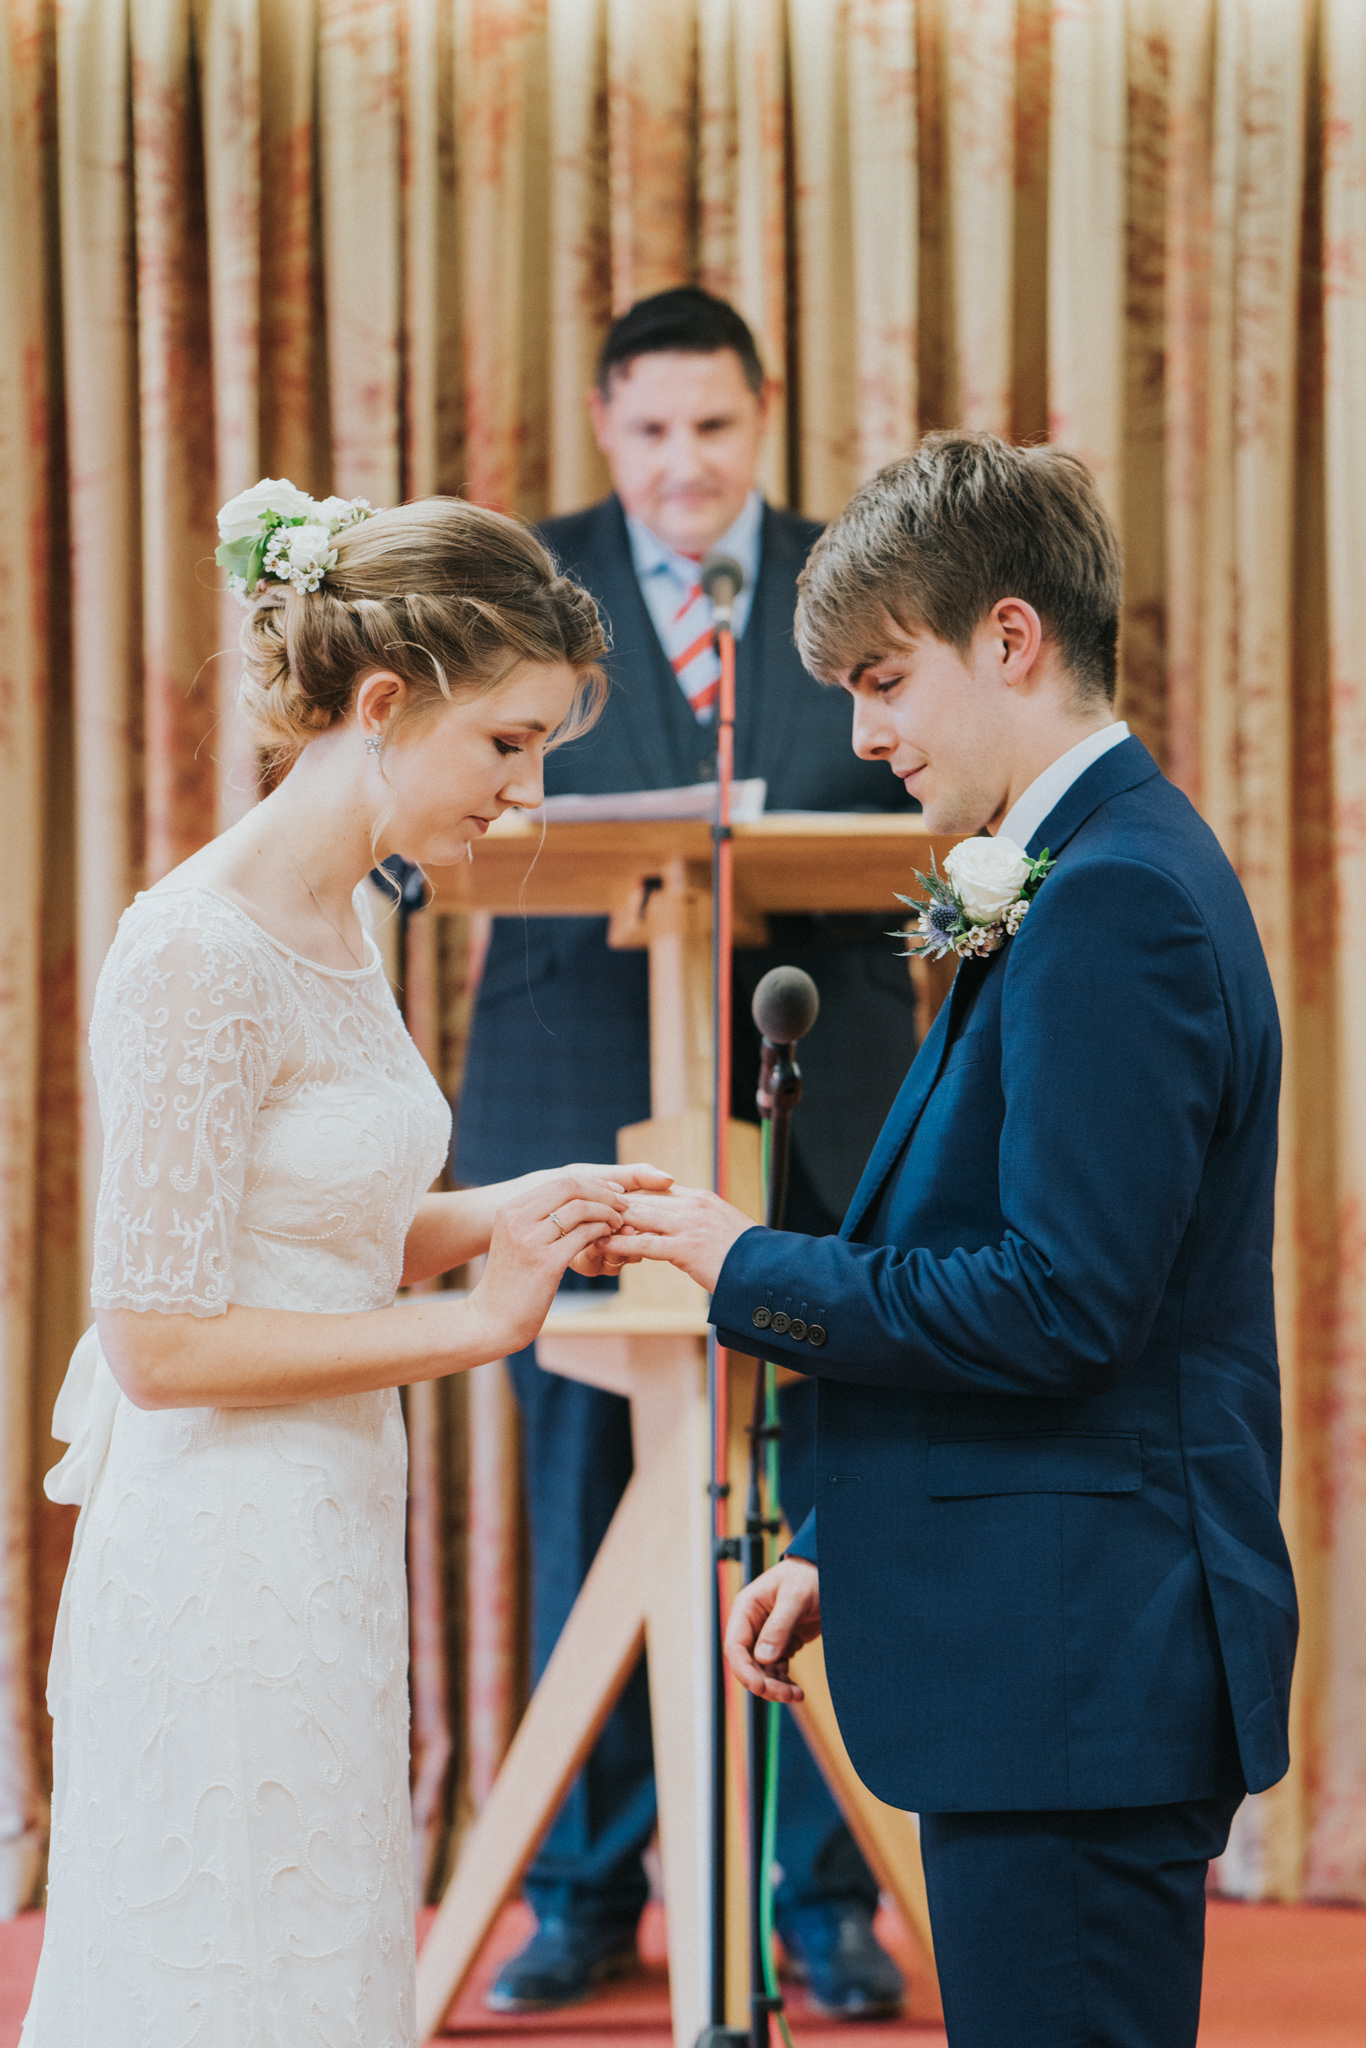 Jess-and-Tom-Norfolk-Alternative-Wedding-Essex-Wedding-Photographer-Grace-Elizabeth-12.jpg